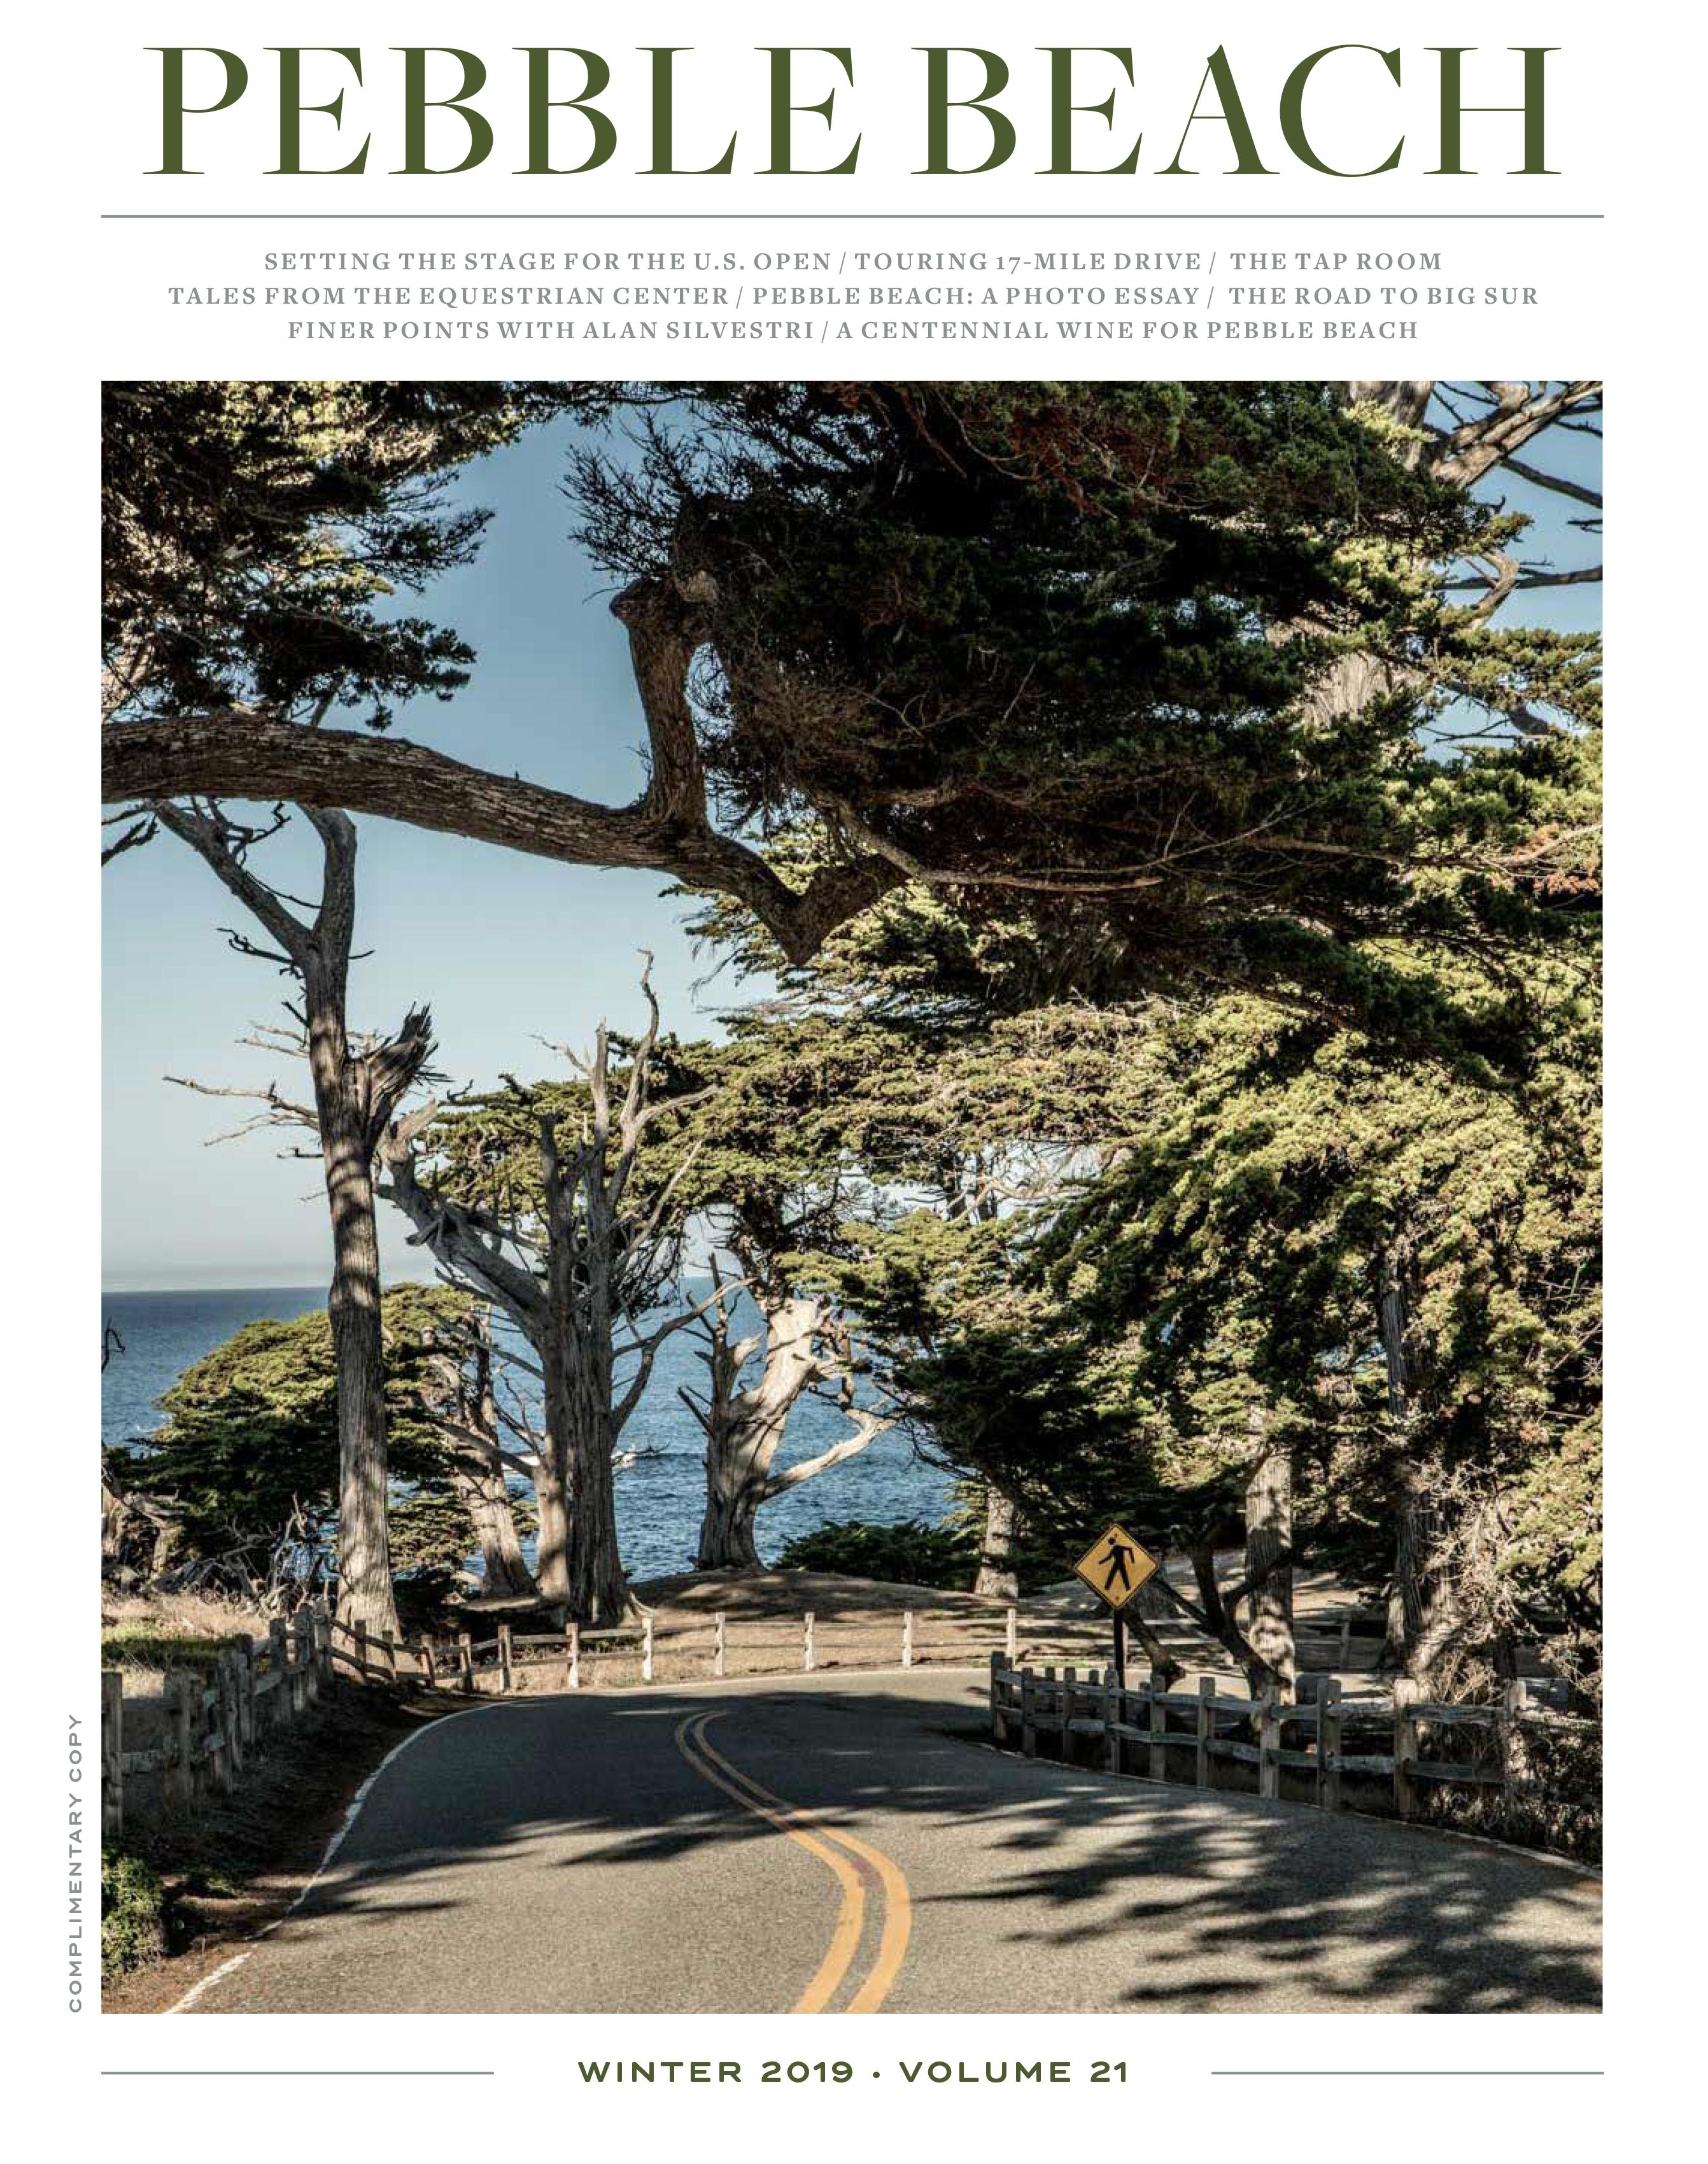 Winter 2019 Pebble Beach The Magazine cover